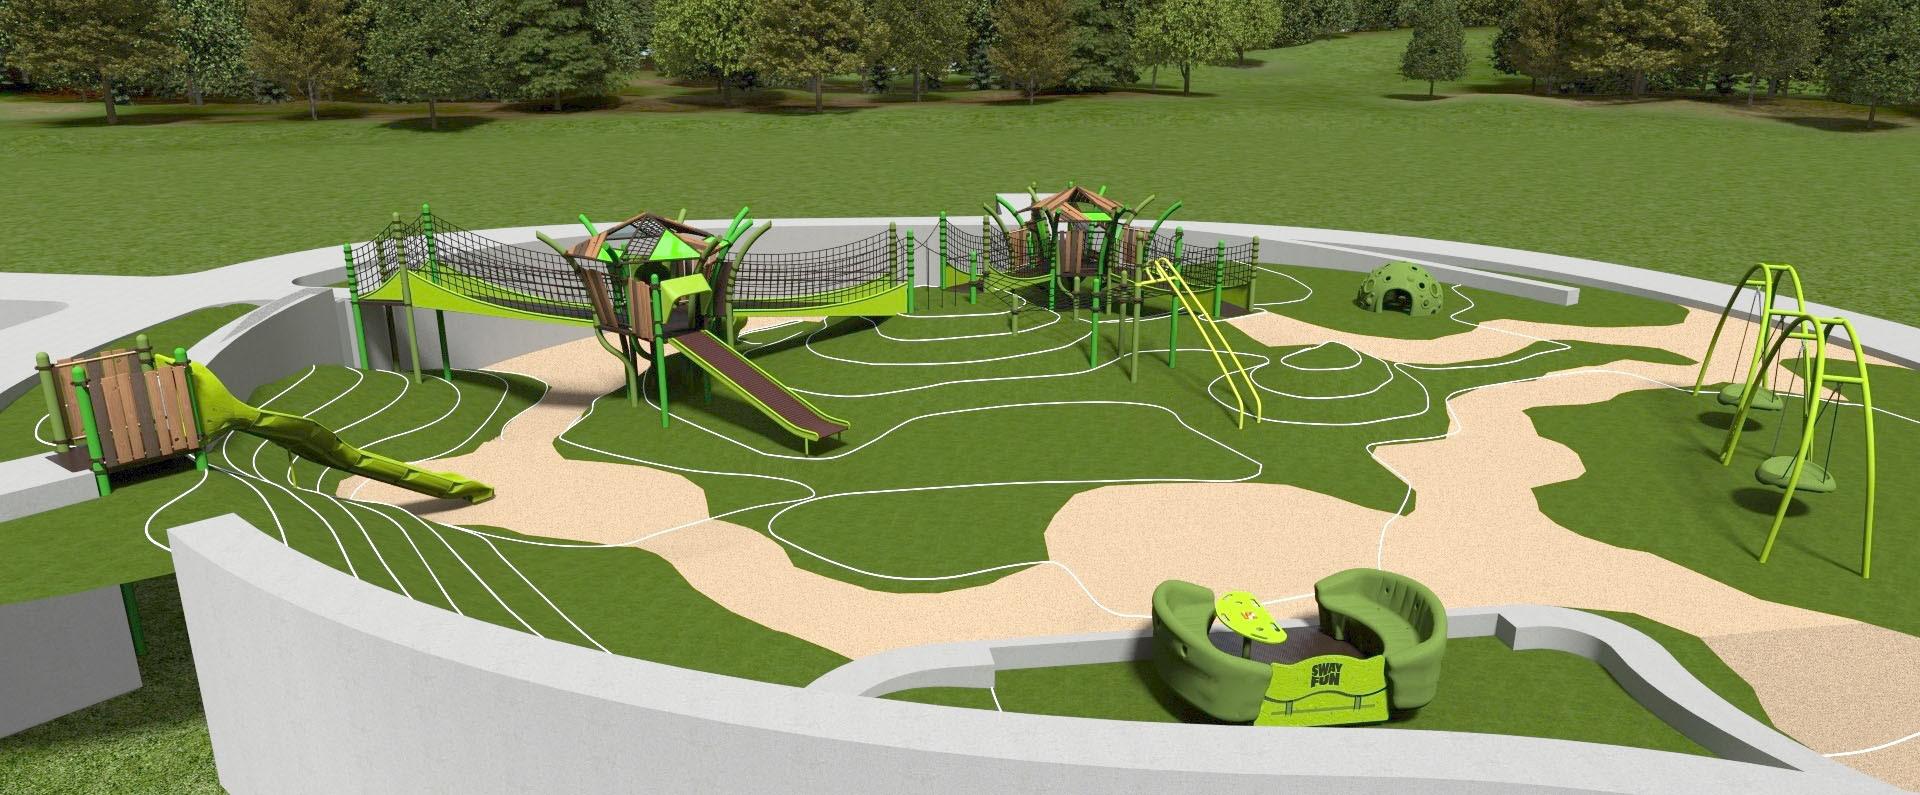 Image result for Landscape Architects